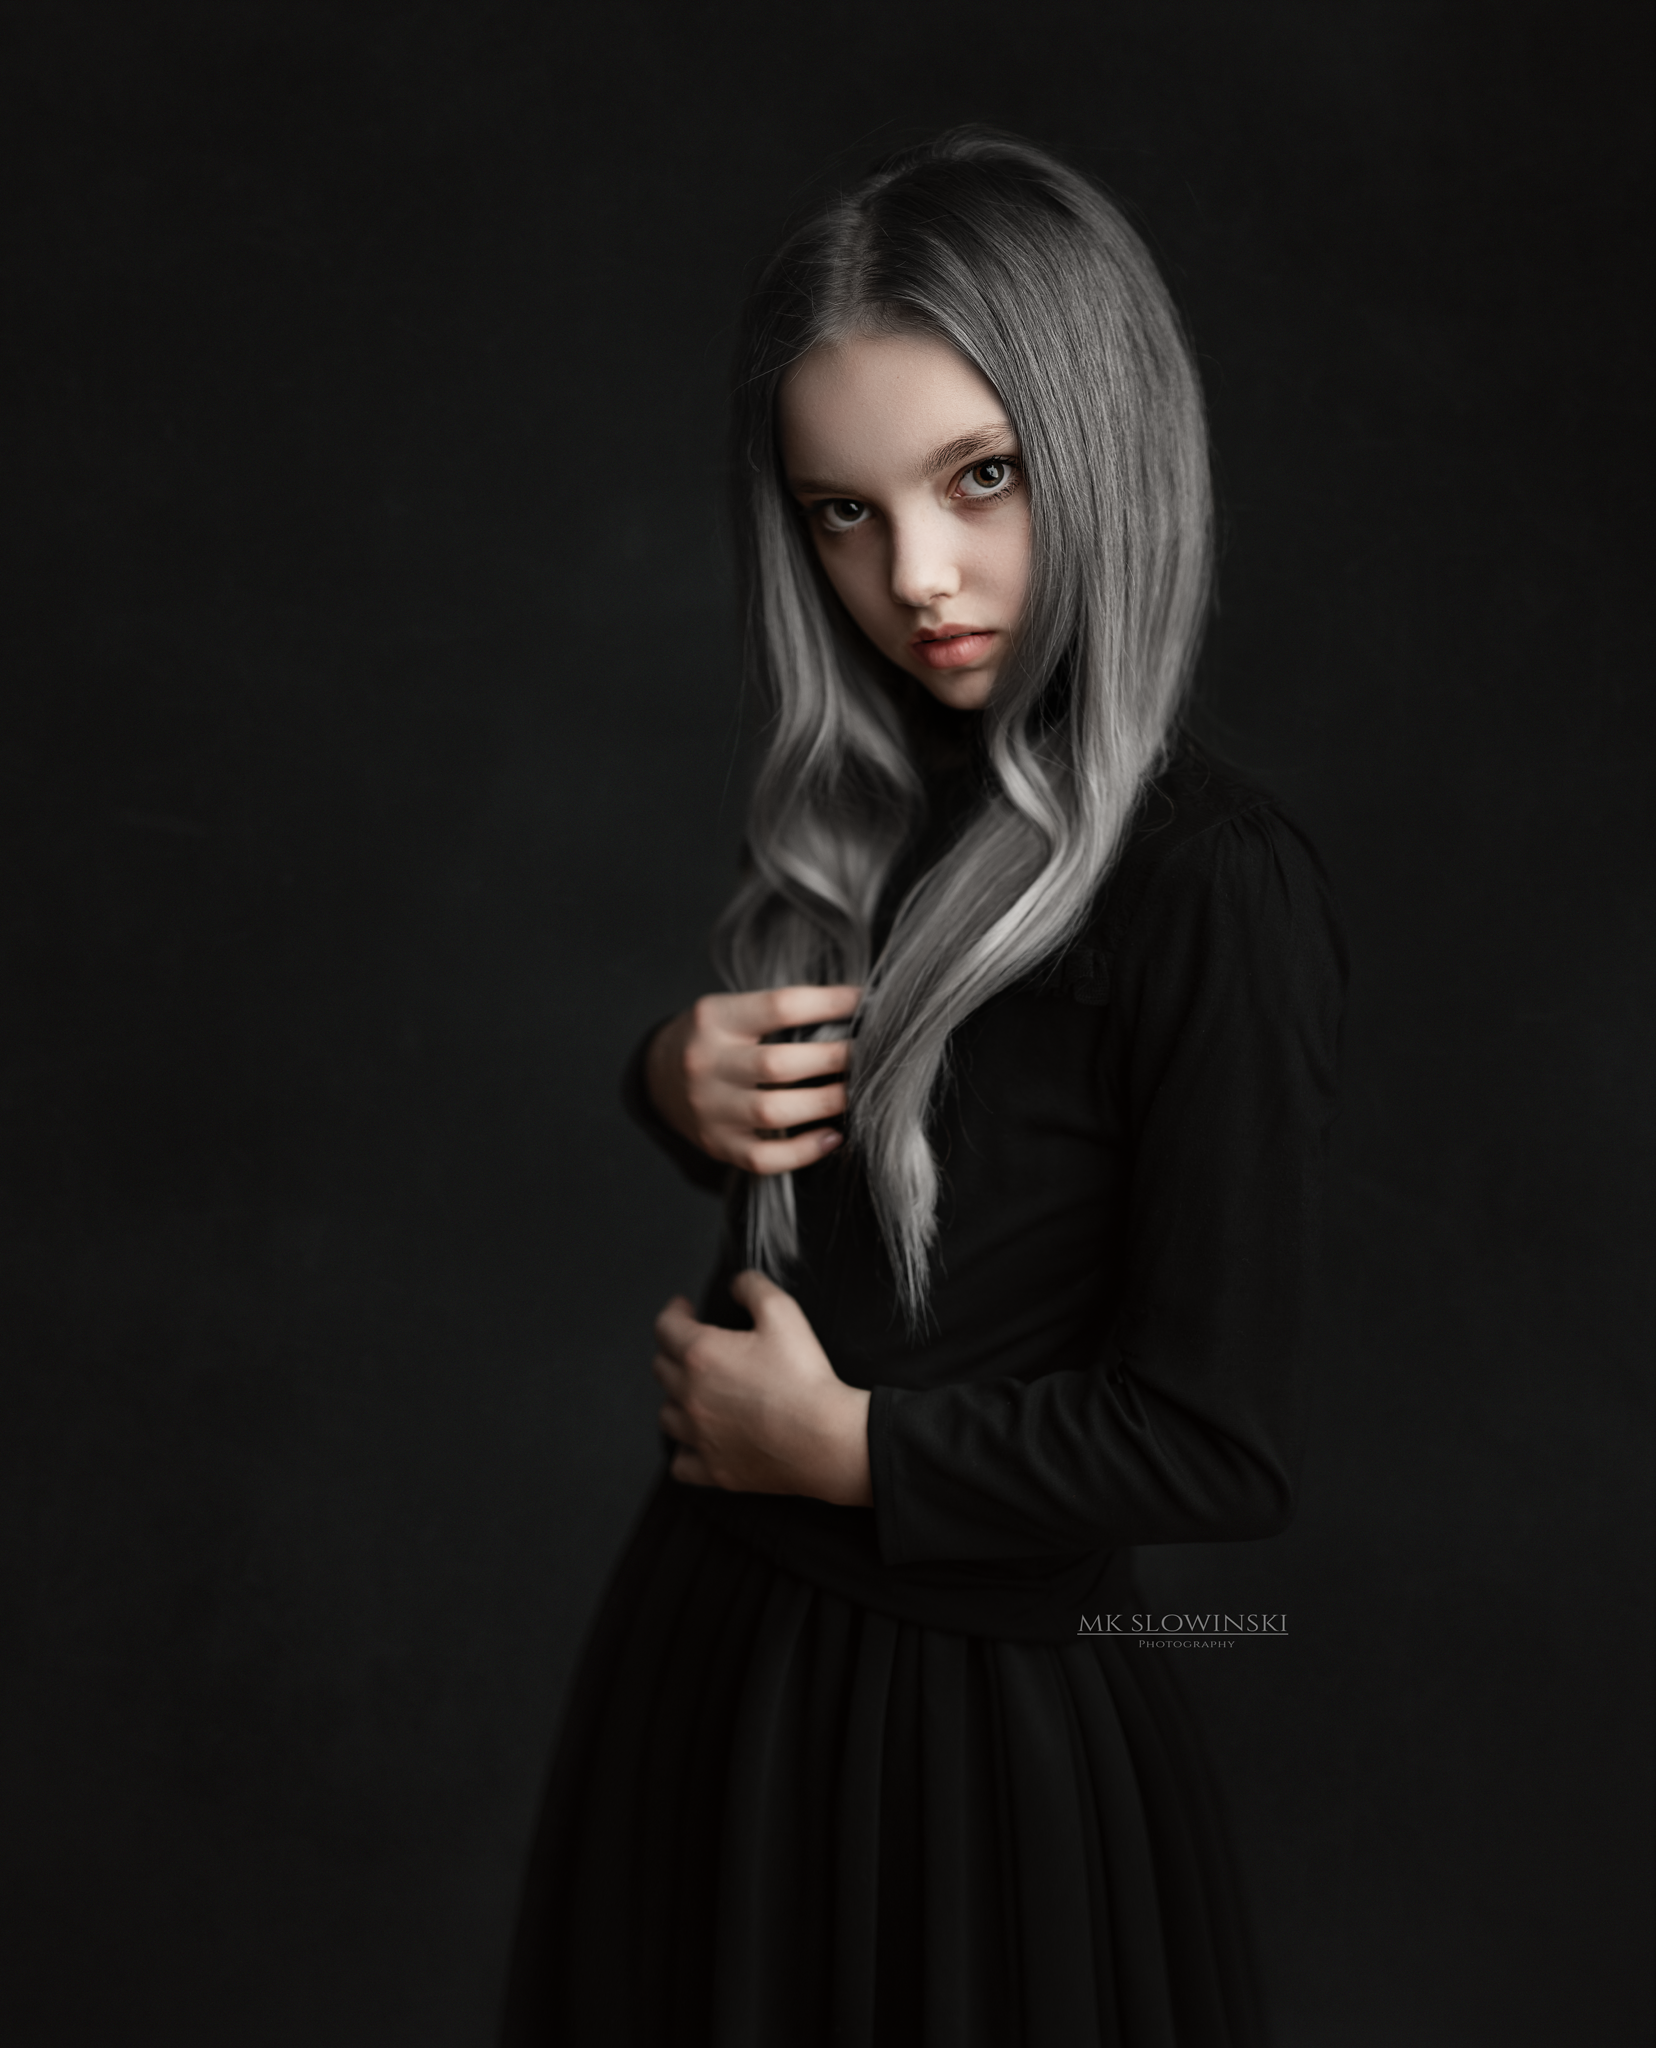 MKS_1908siwe